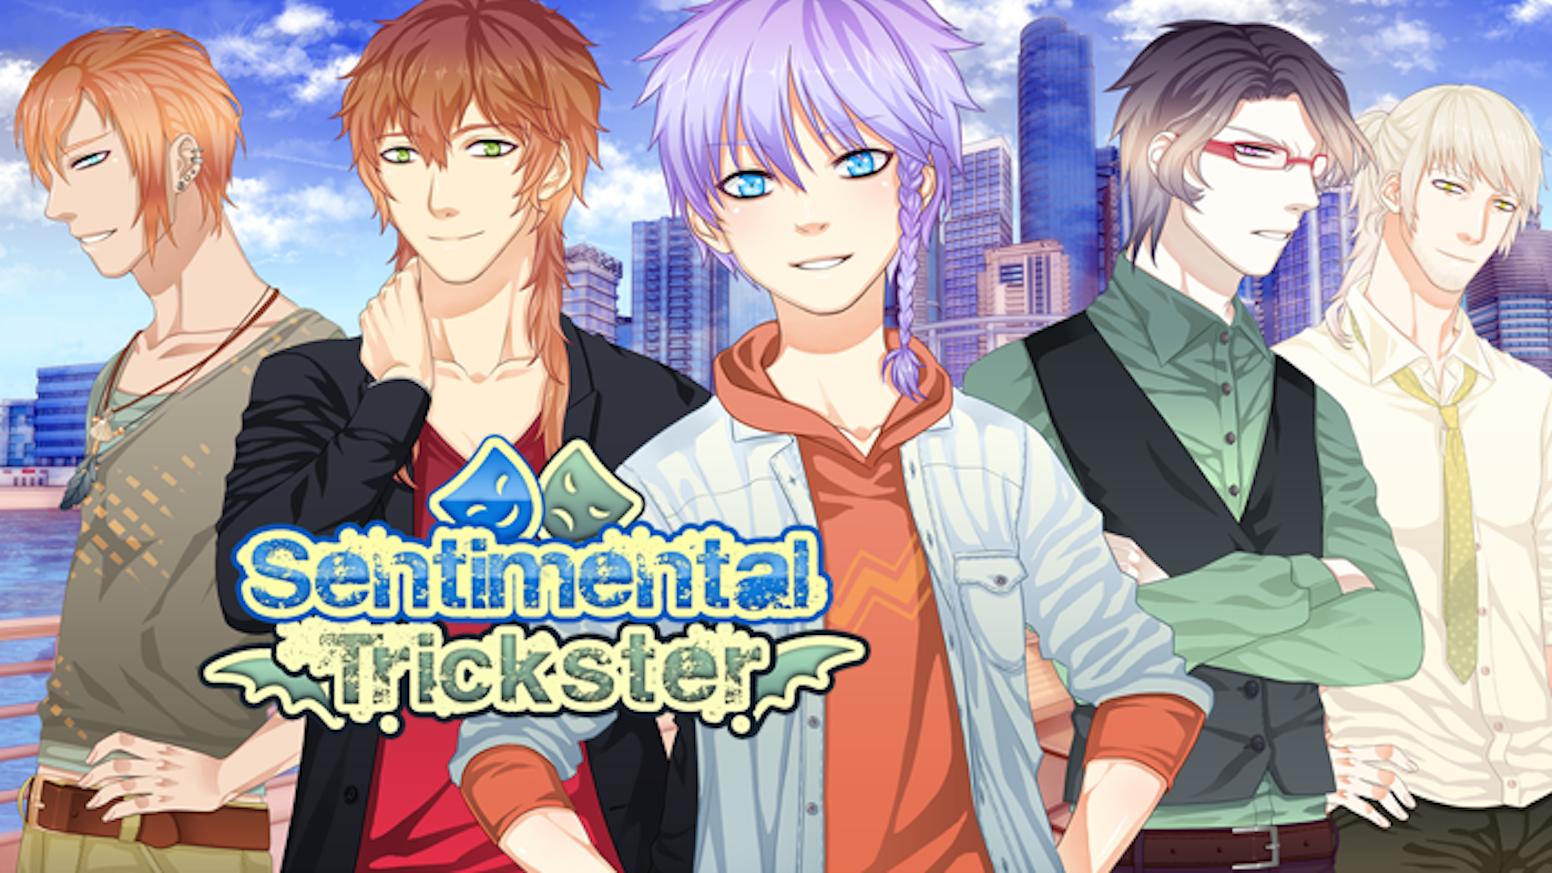 Sentimental Trickster: English BL Yaoi Visual Novel by Yaoi